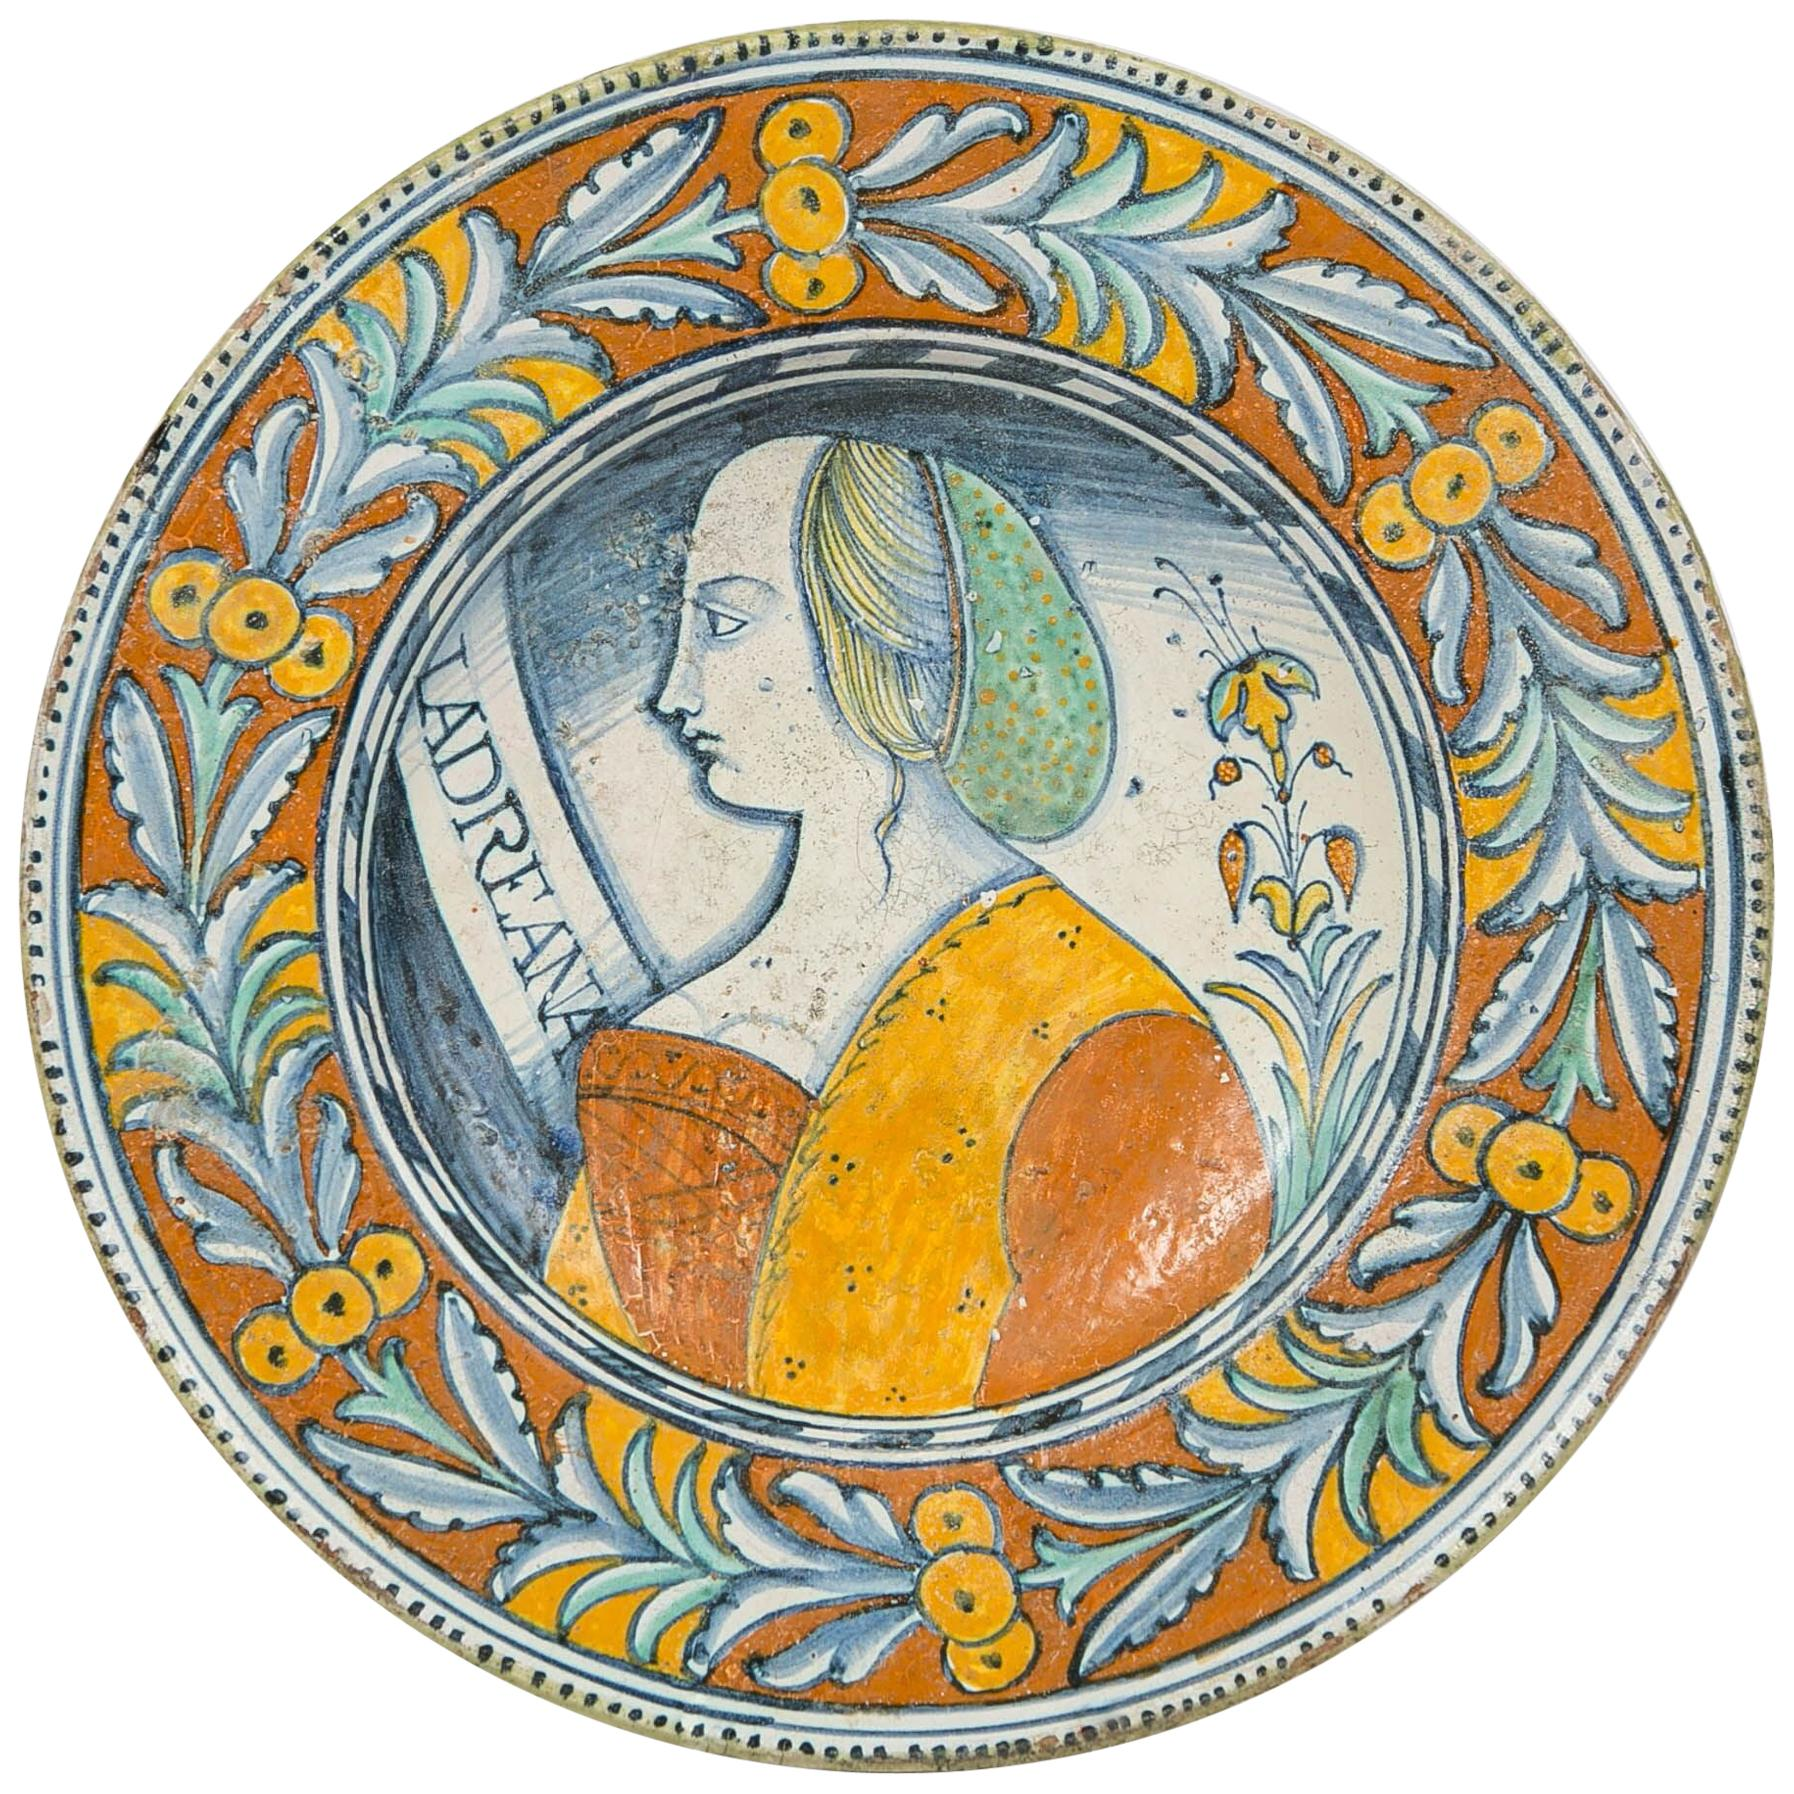 Renaissance Maiolica Portrait Charger Made in Deruta, Italy, circa 1530